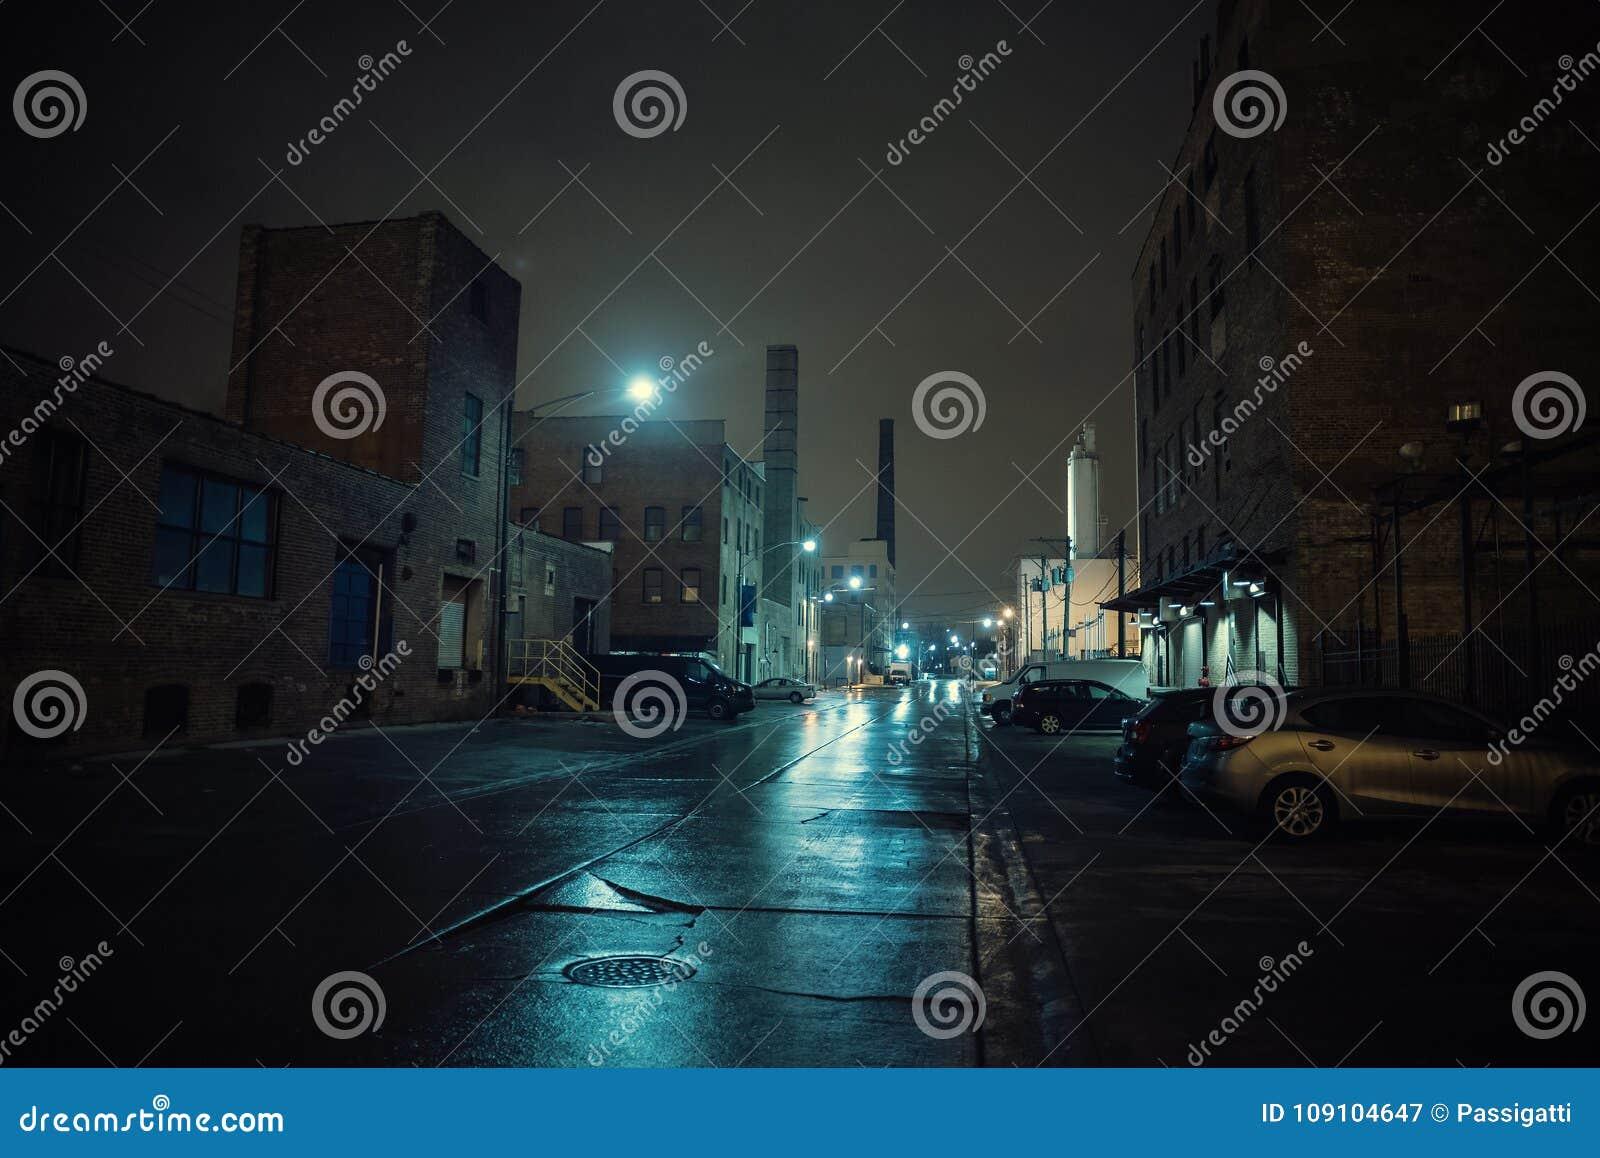 Foggy industrial urban street city night scenery.